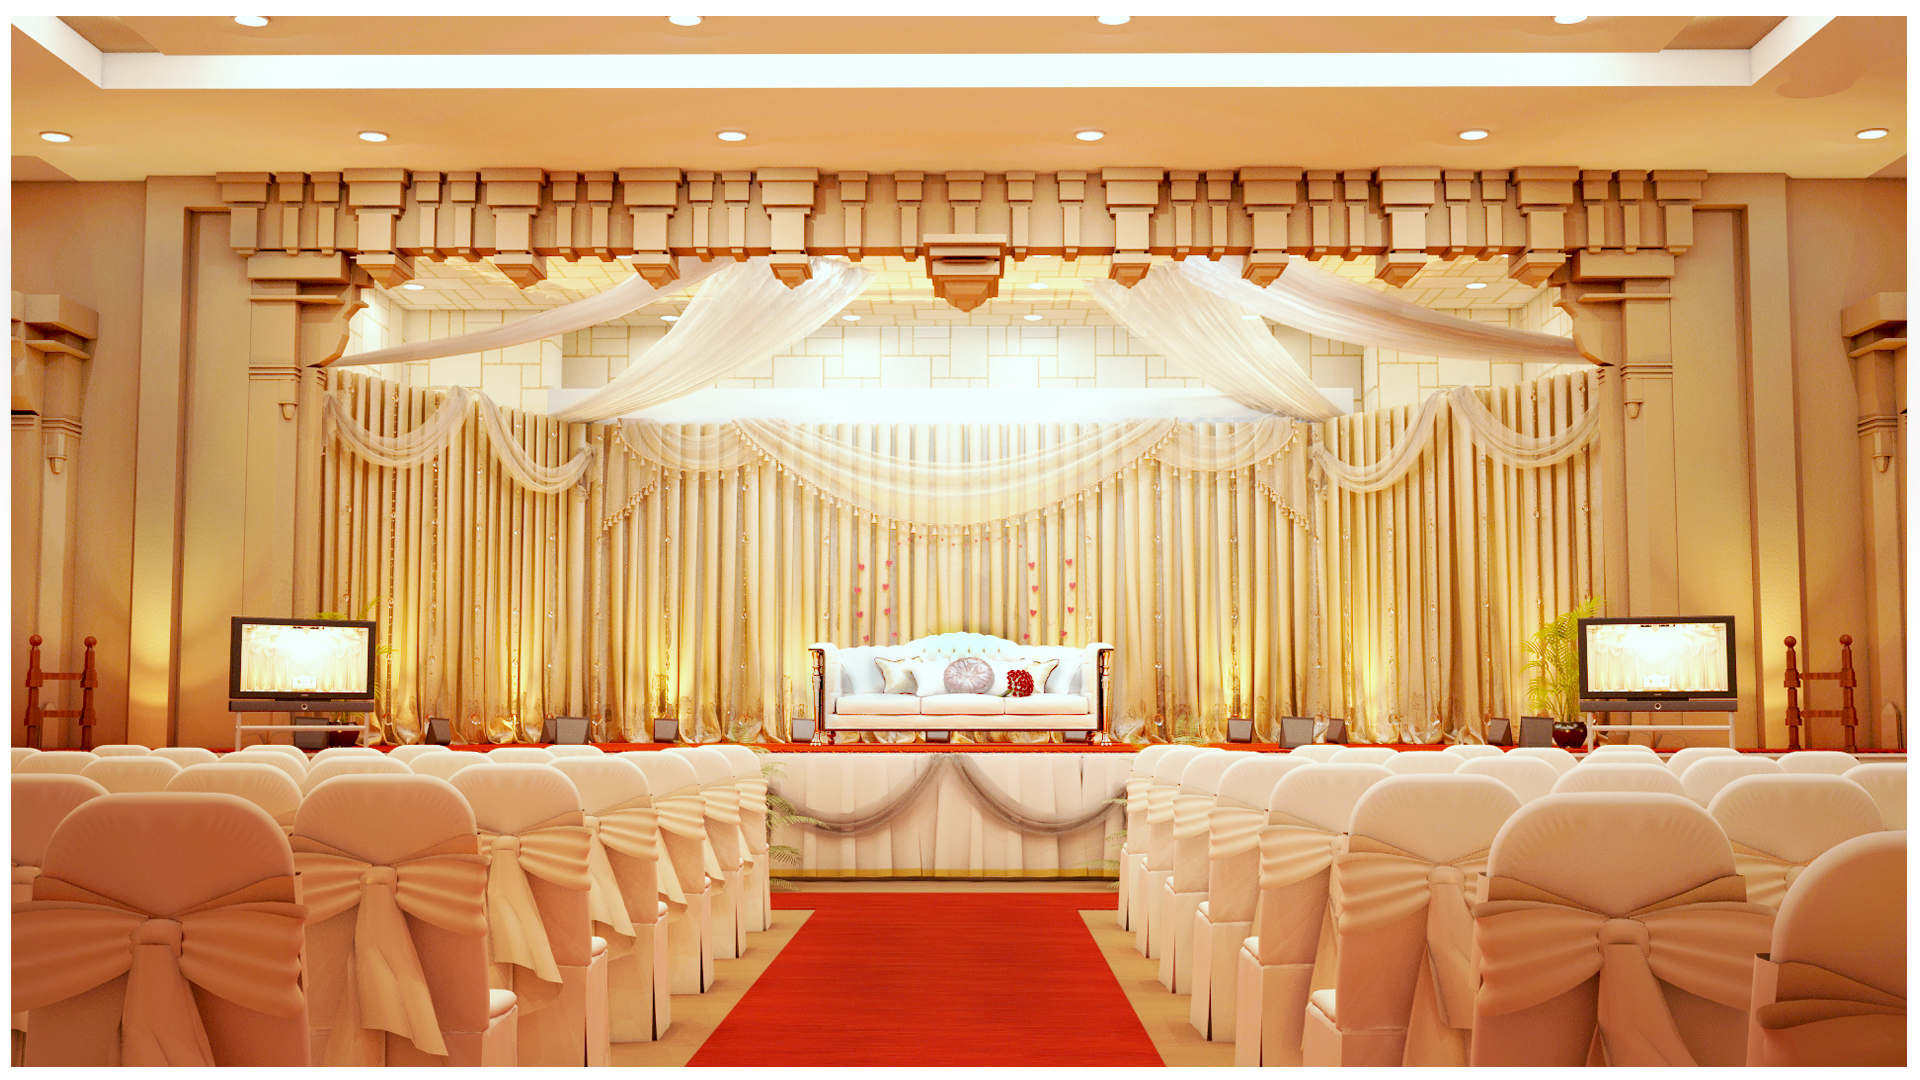 Indian Wedding Hall By Sathish Ar